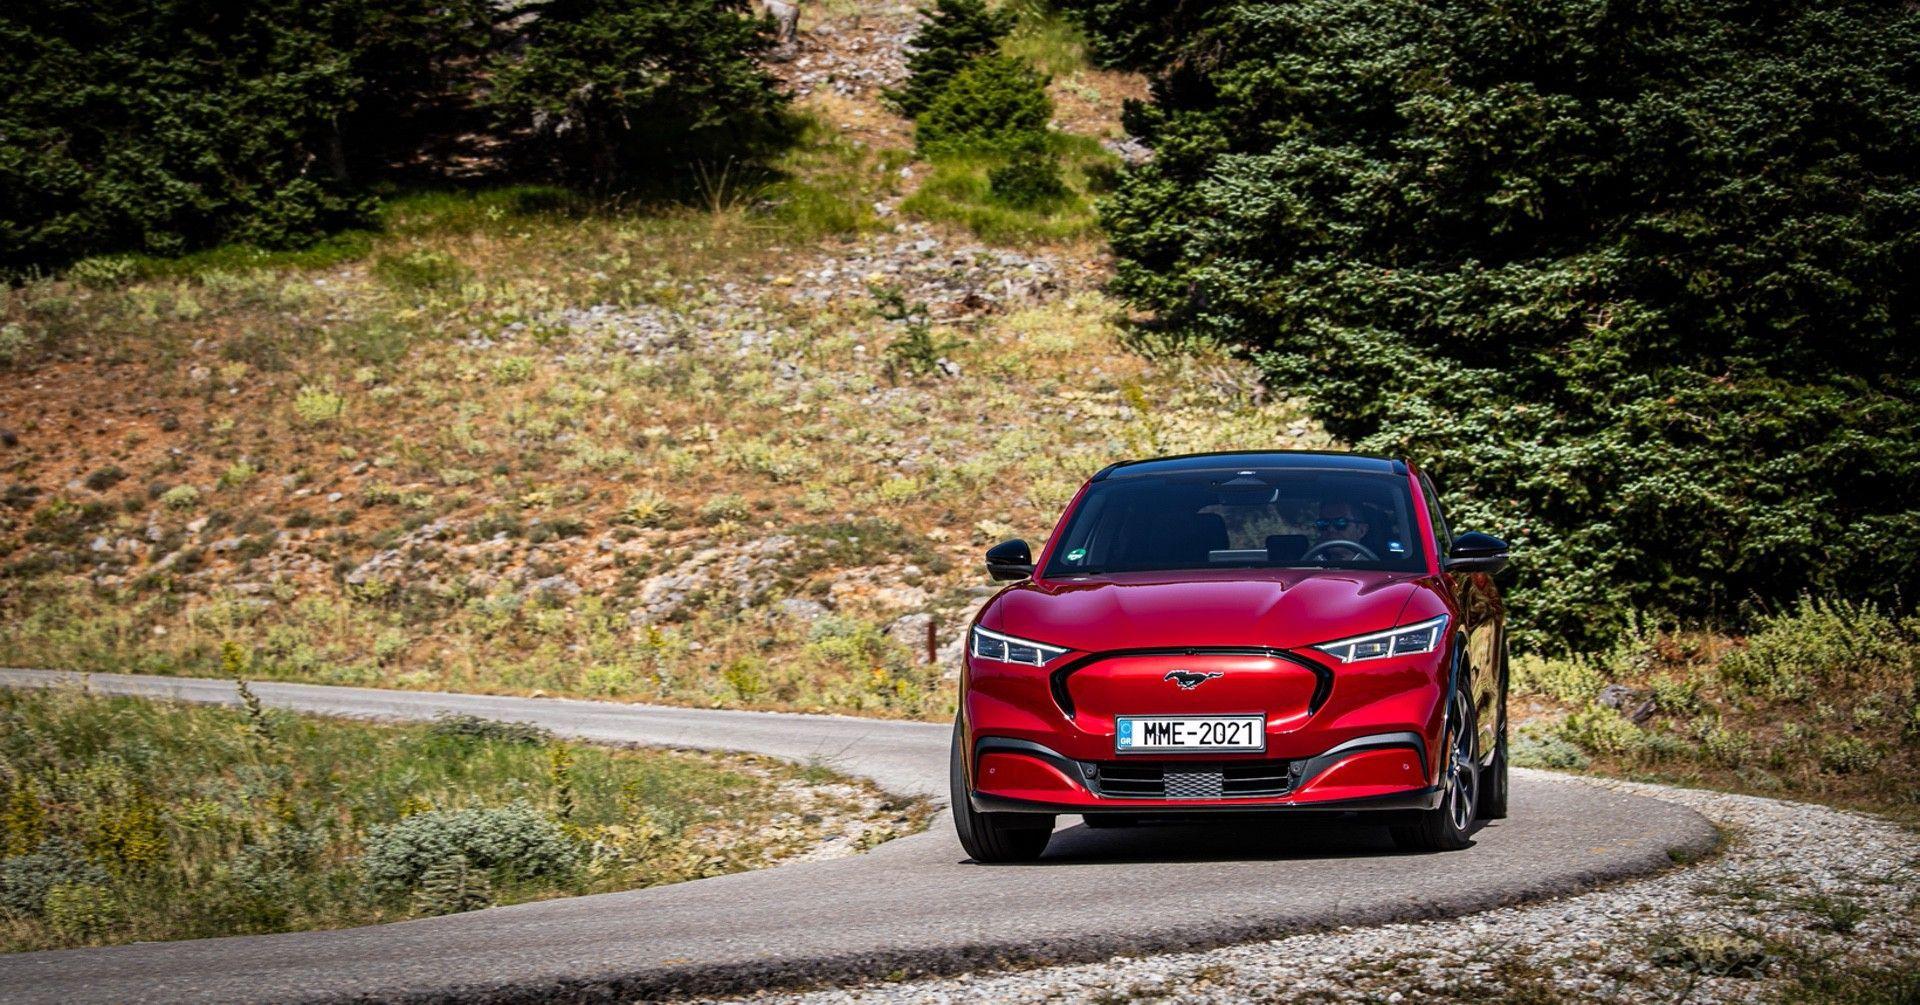 Ford_Mustang_Mach-E_greek_presskit-0140